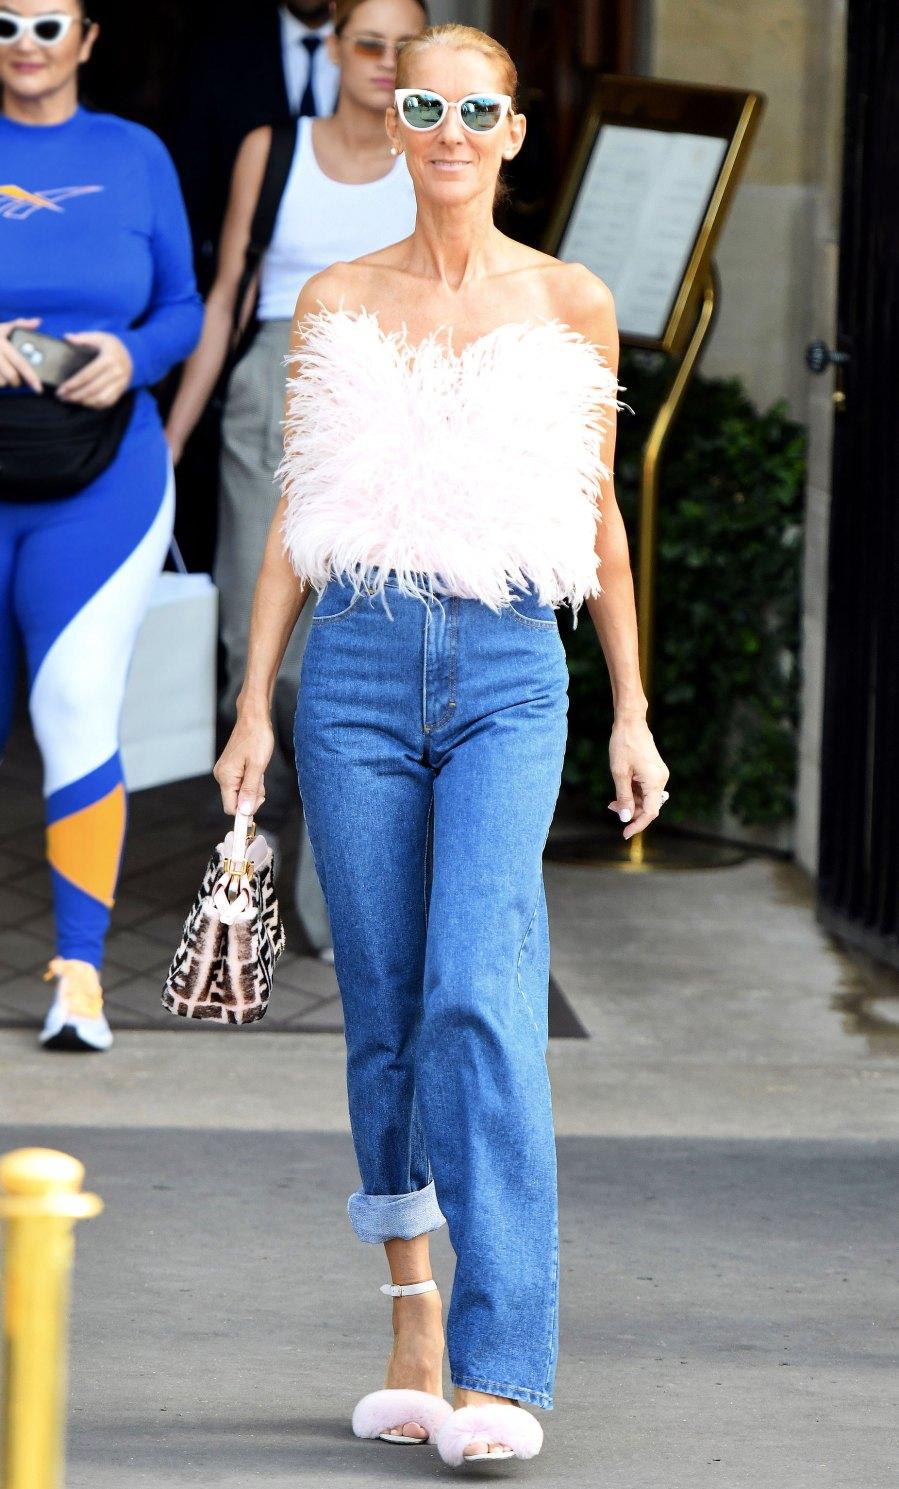 Celine Dion Shaggy Pink Top June 28, 2019